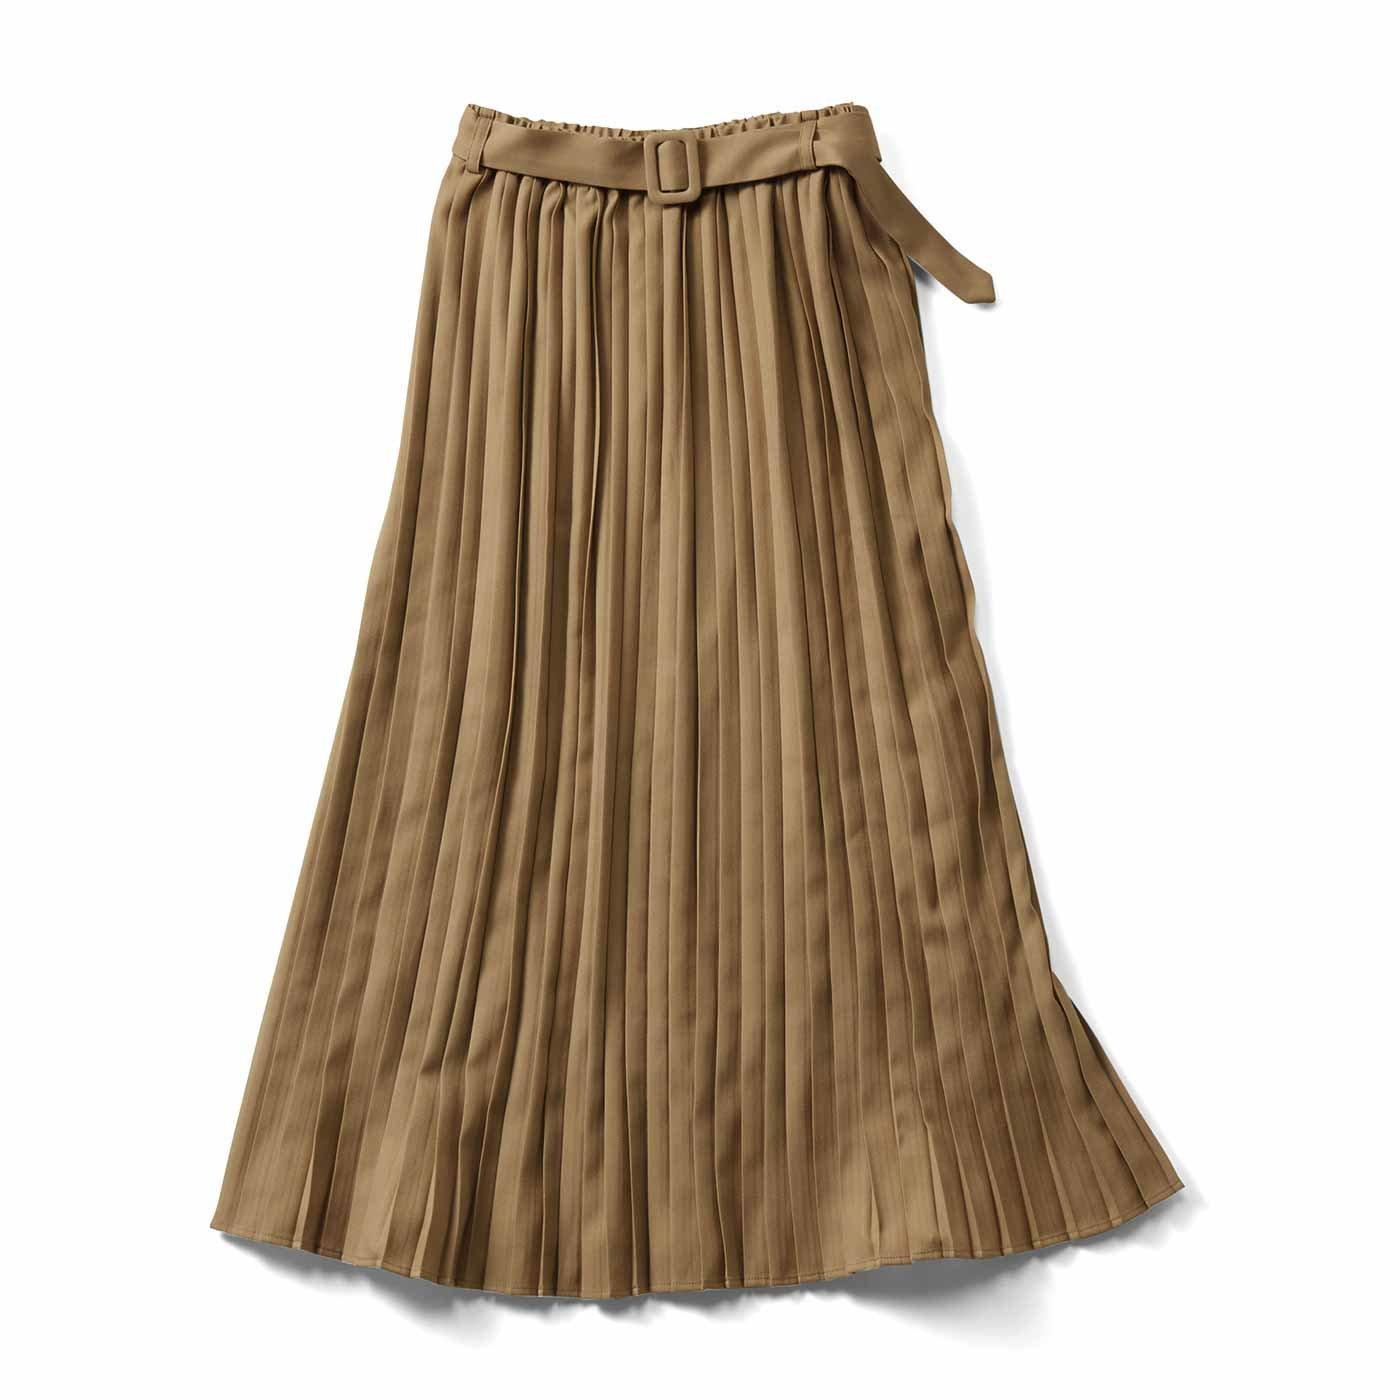 IEDIT[イディット] ピーチ起毛素材の上品プリーツスカート〈ベージュ〉